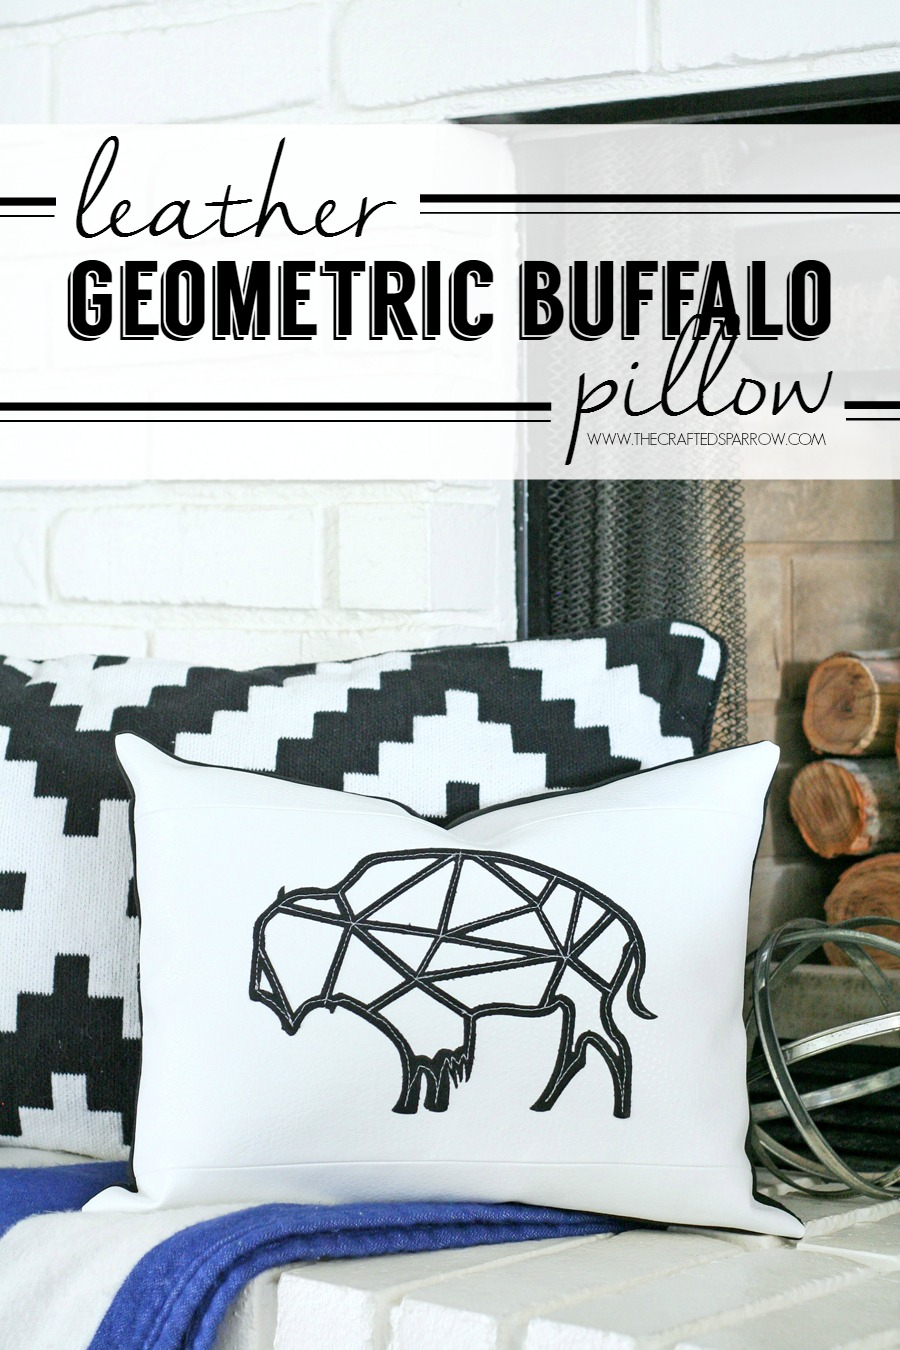 Leather Geometric Buffalo Pillow